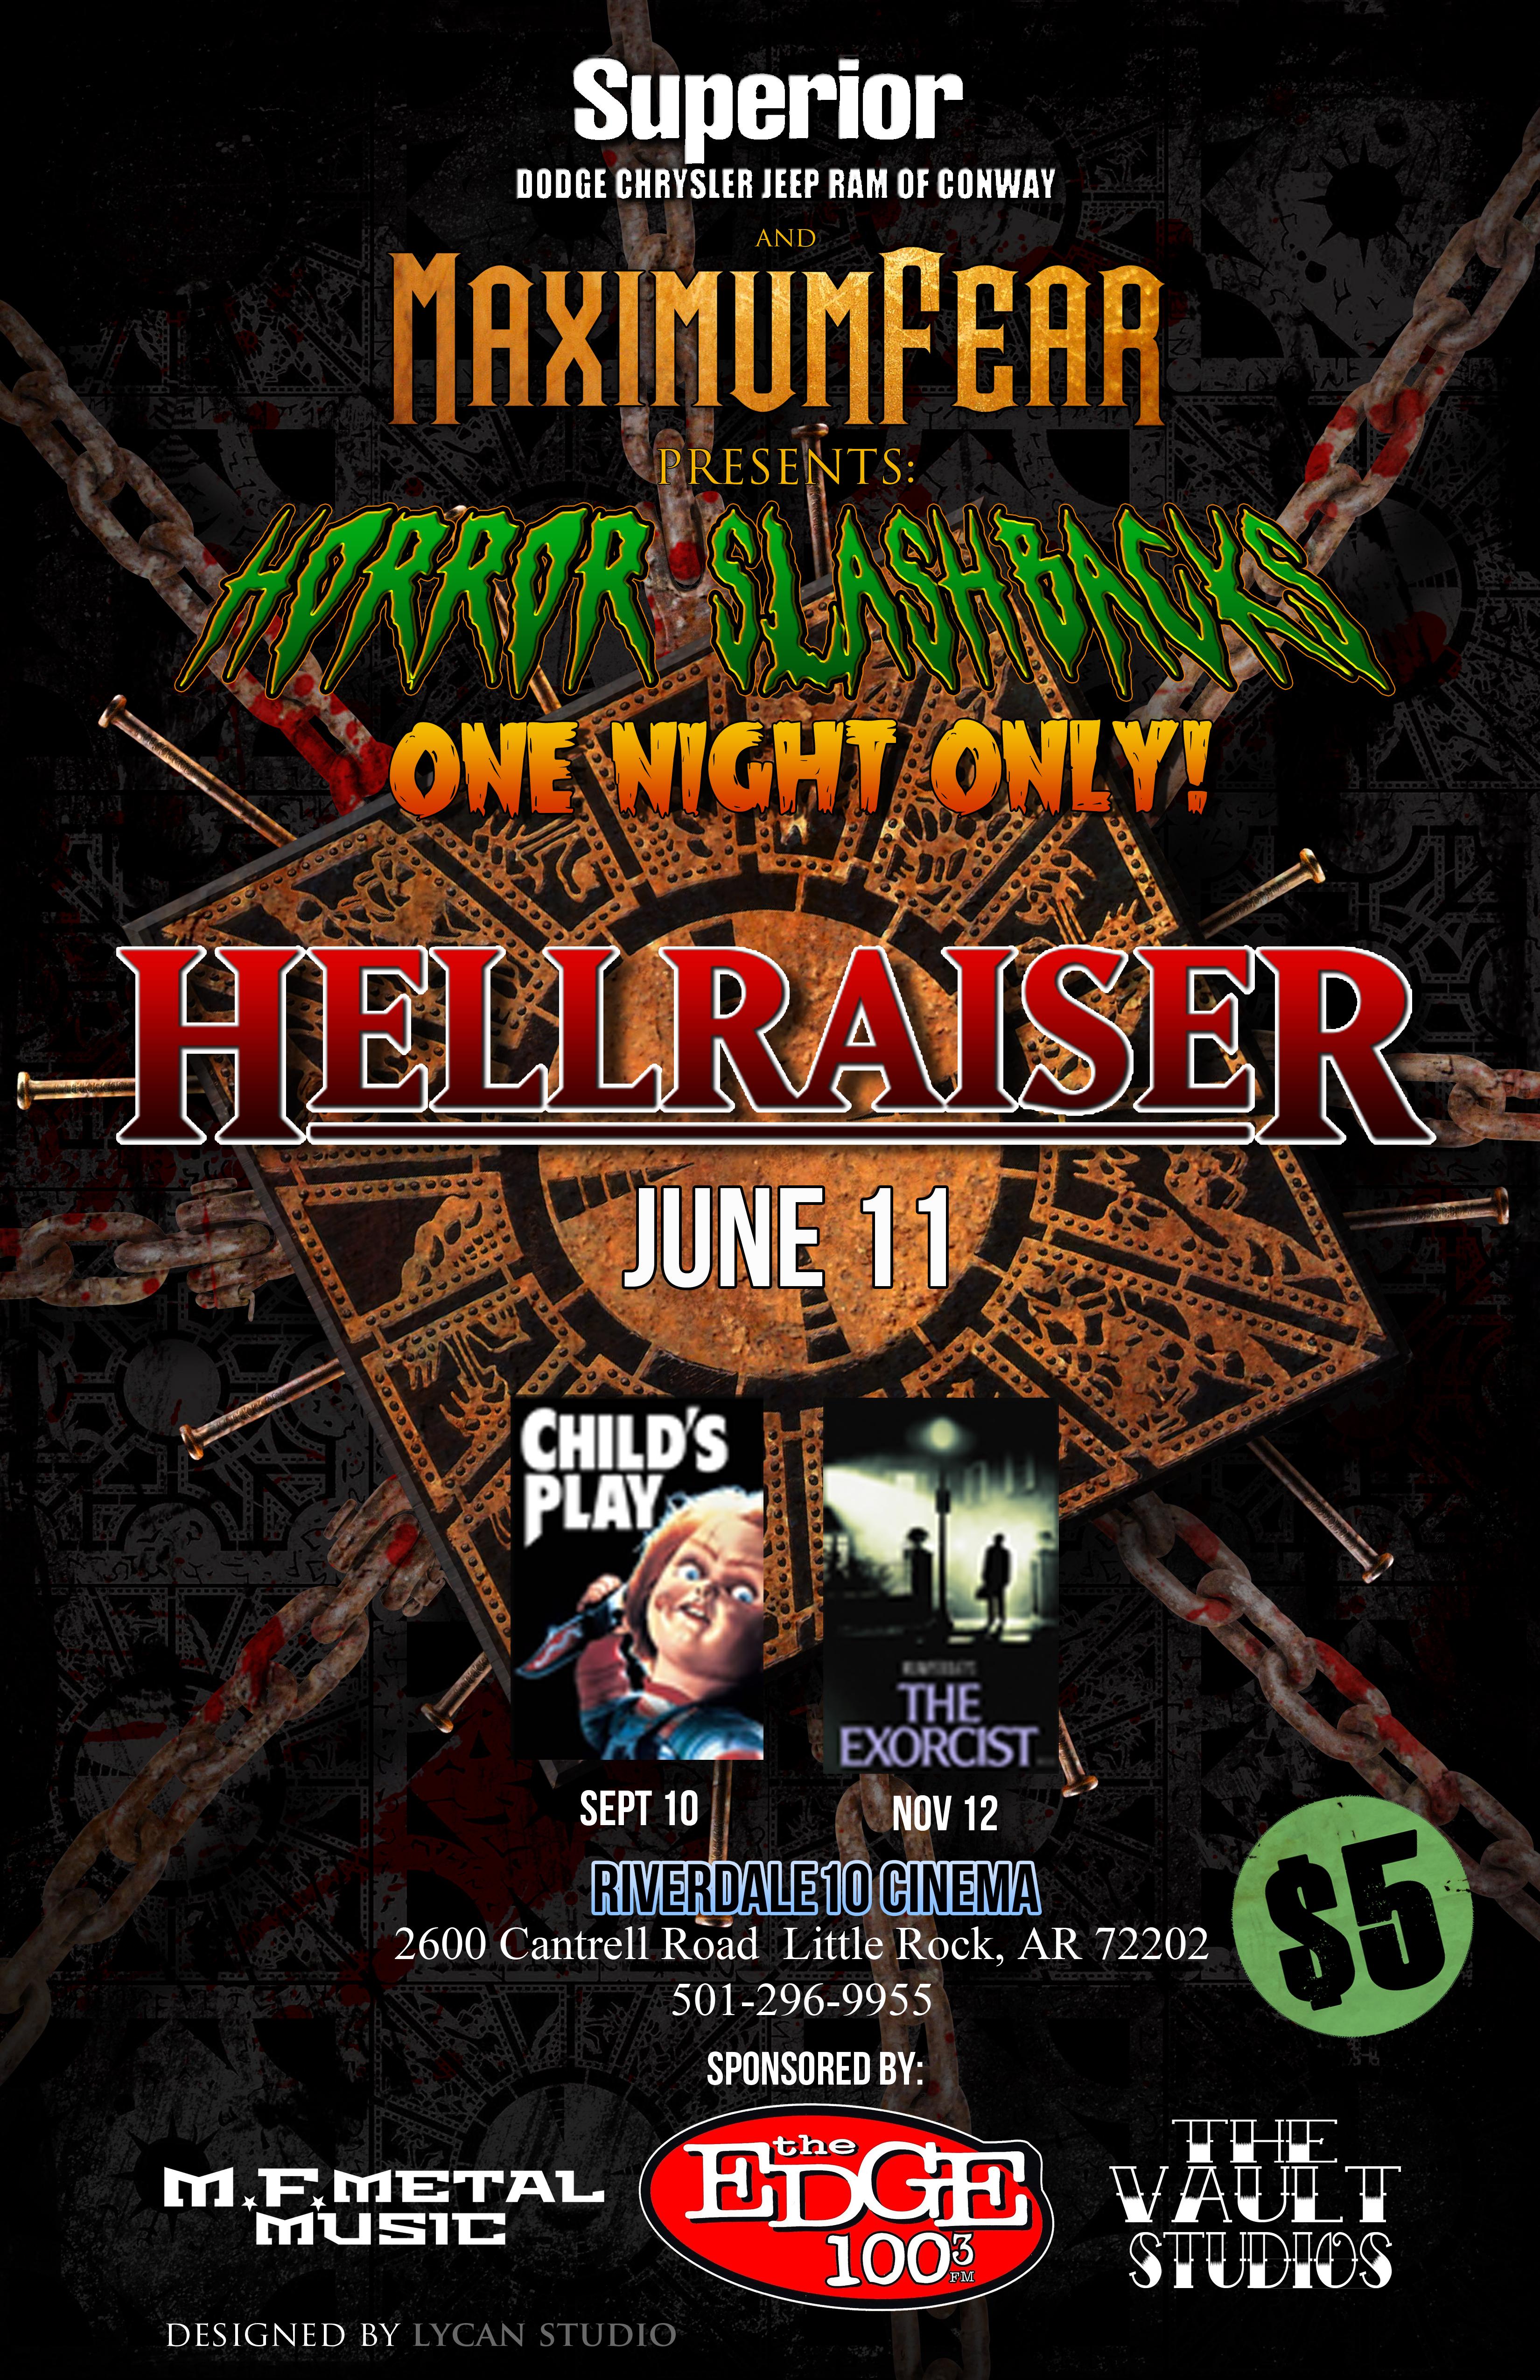 06/11/15 - Hellraiser